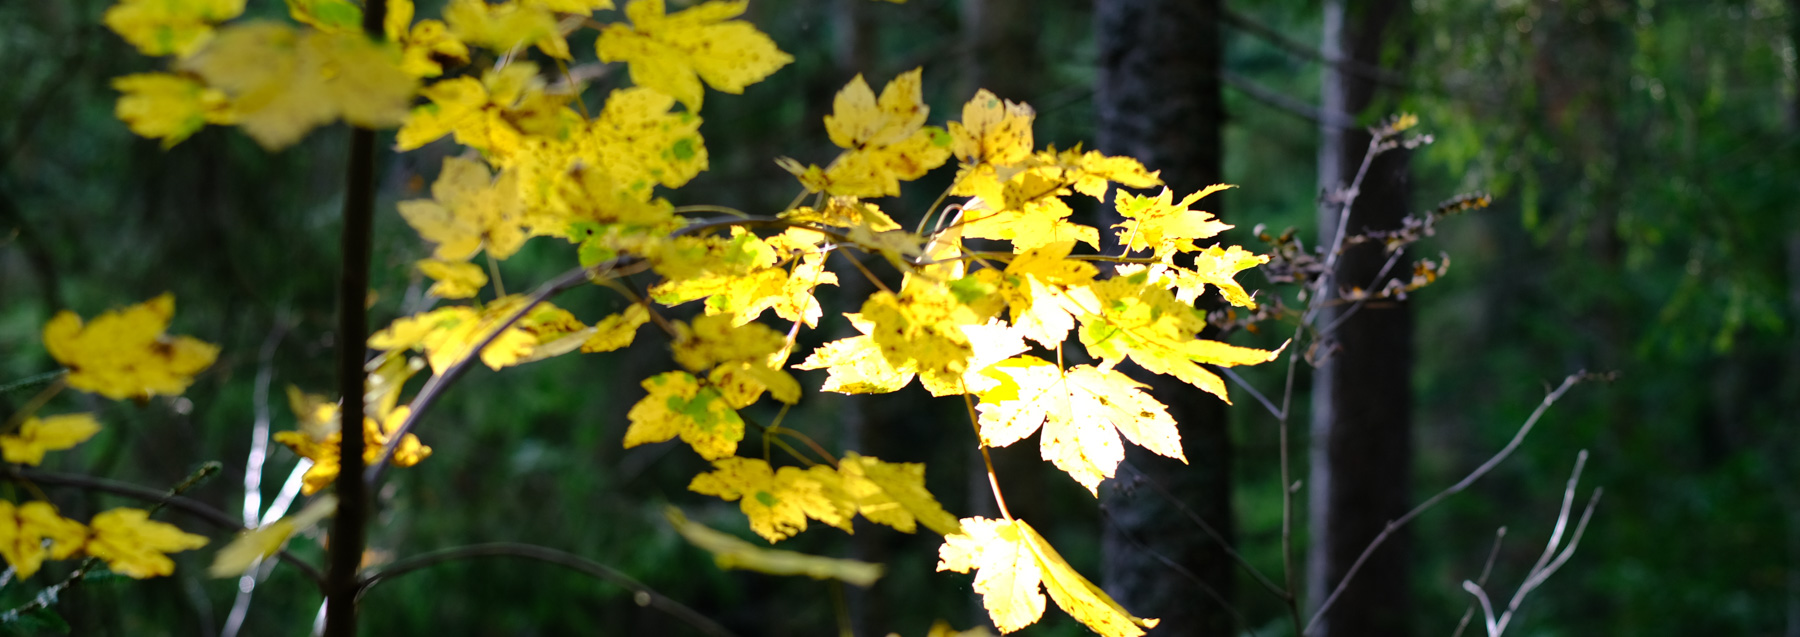 Herbstspaziergang im Zauberwald